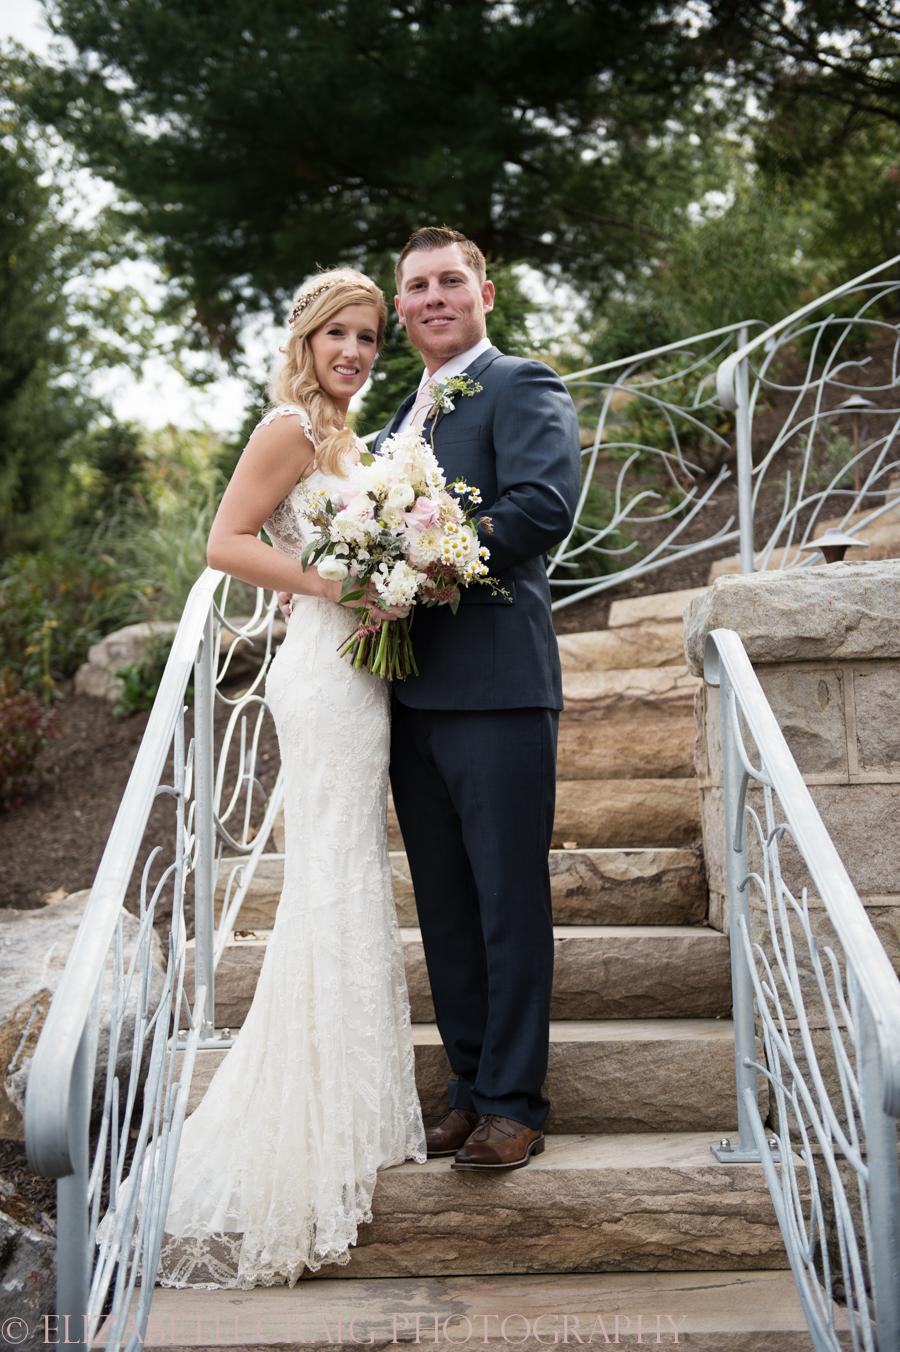 Dubois Brockway St. Marys PA Weddings-0114